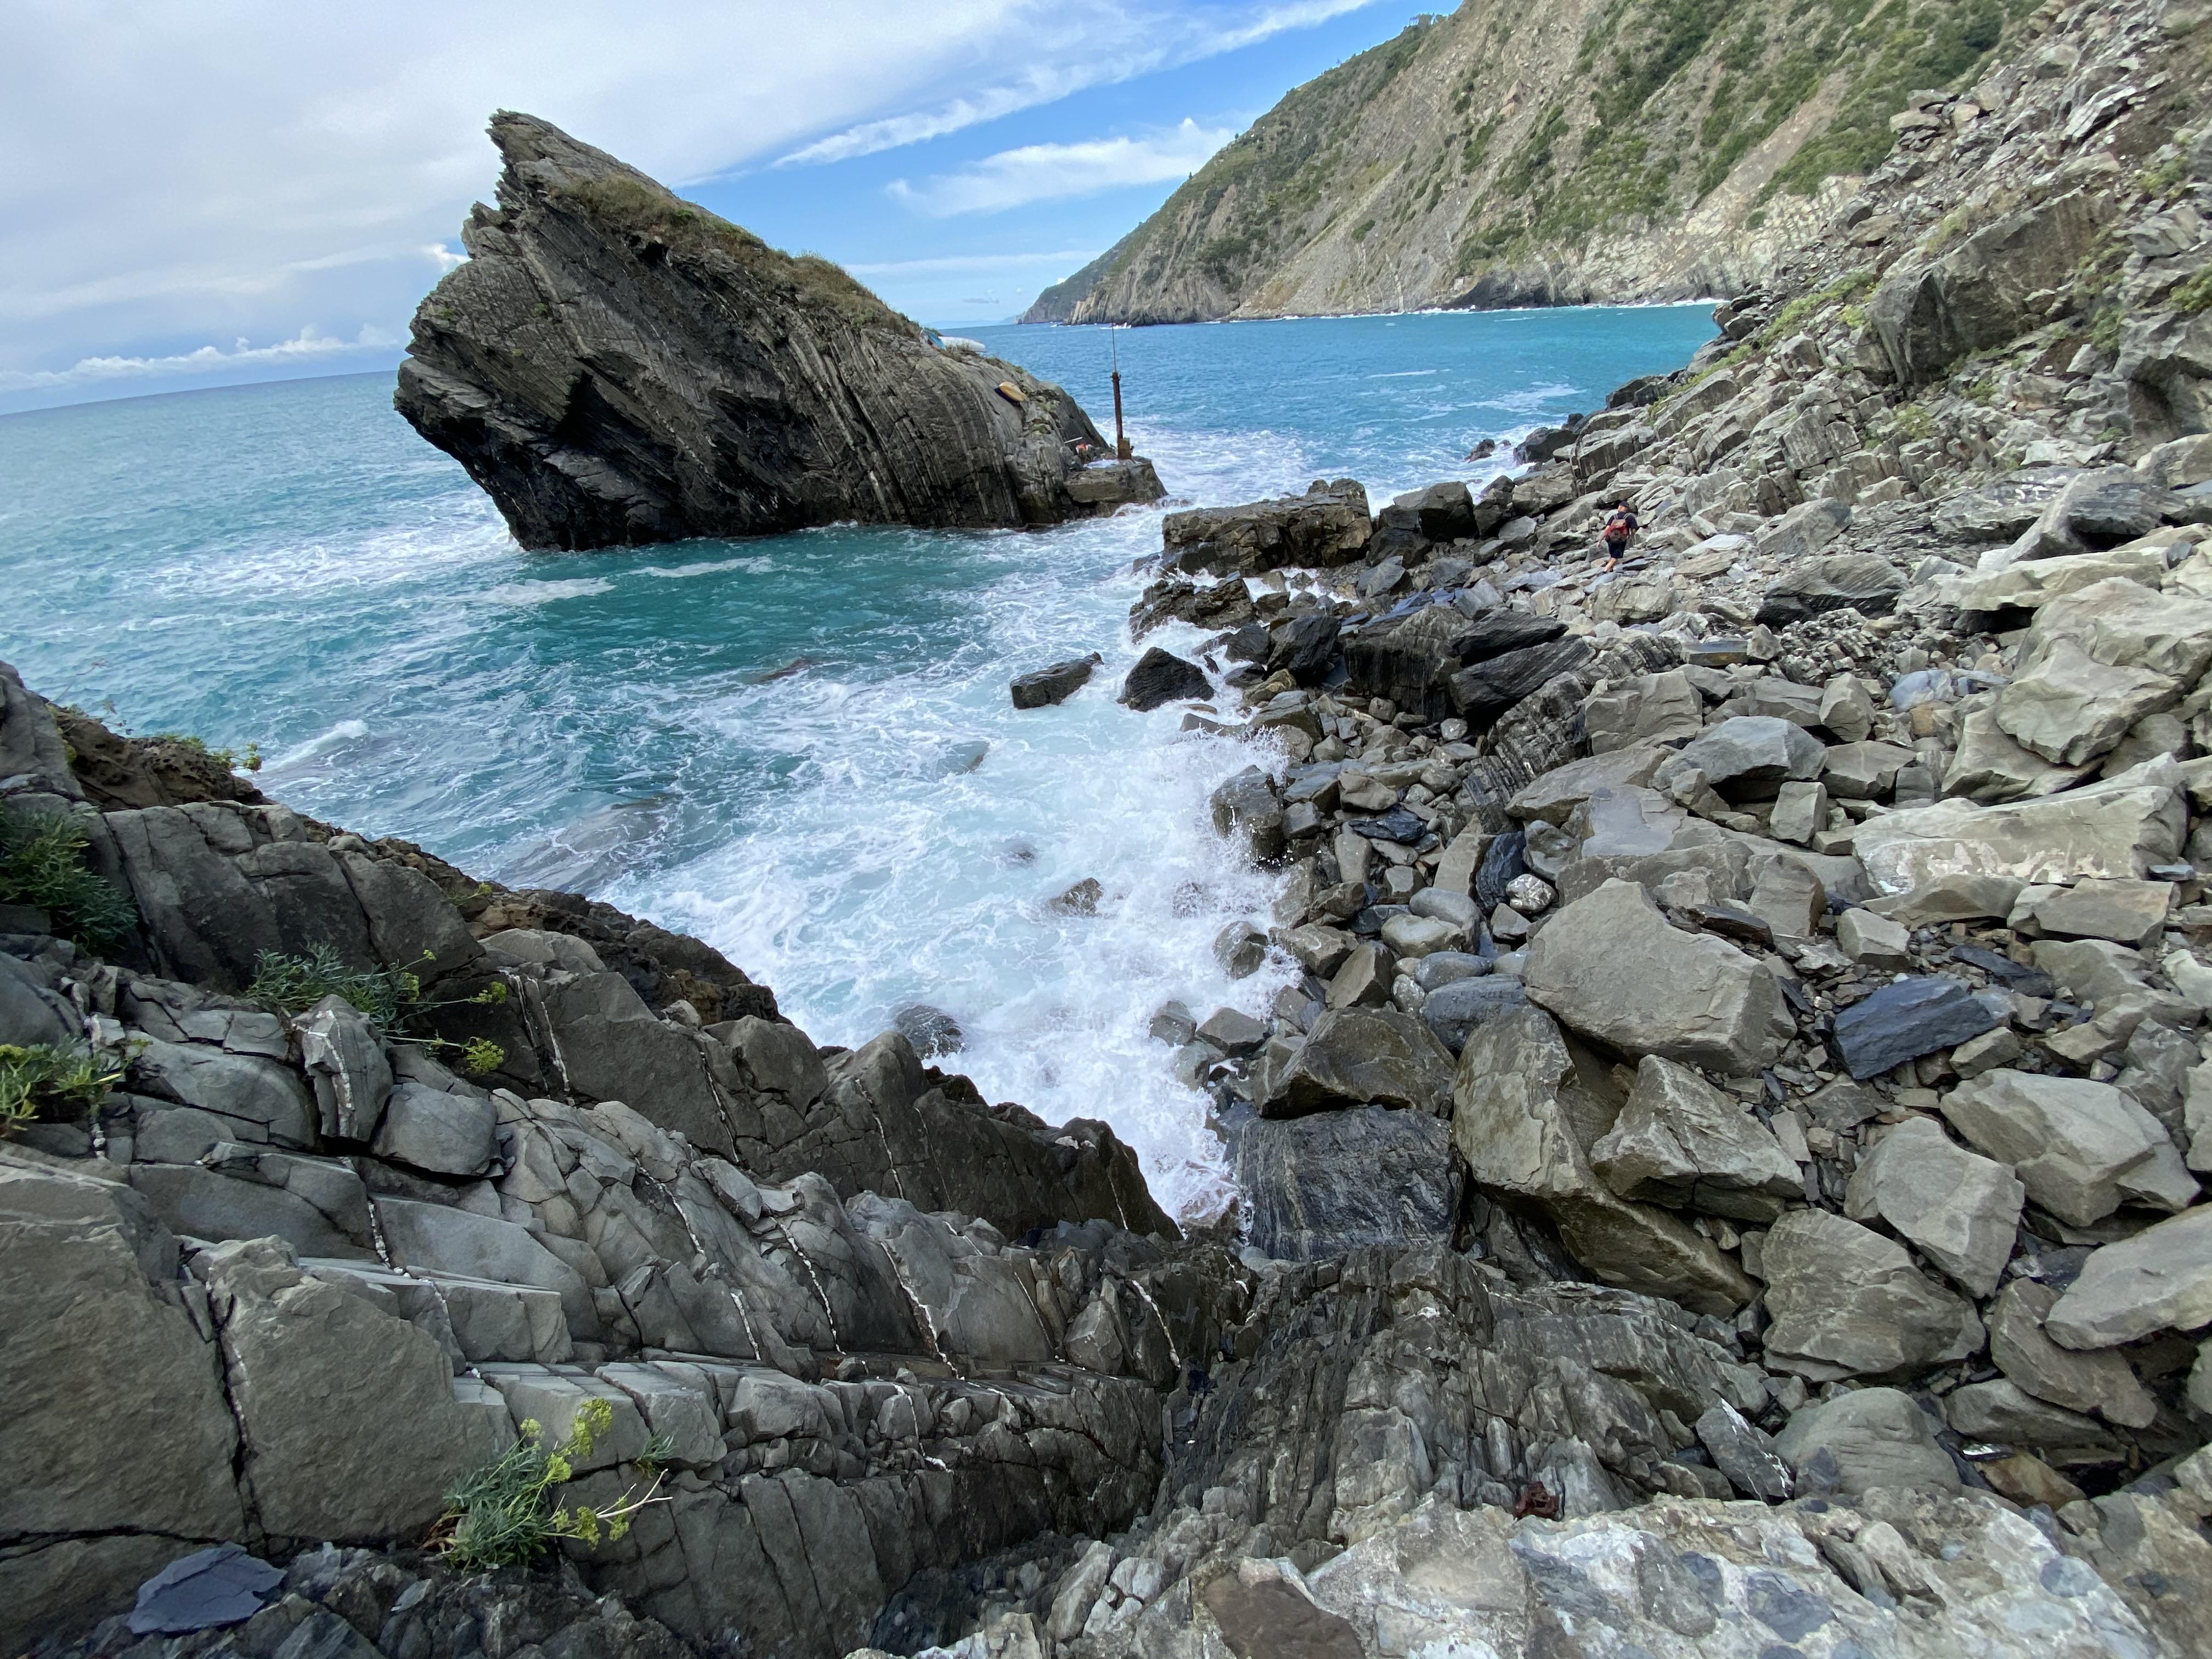 Hang von Tramonti, Ligurien Nationalpark Cinque Terre